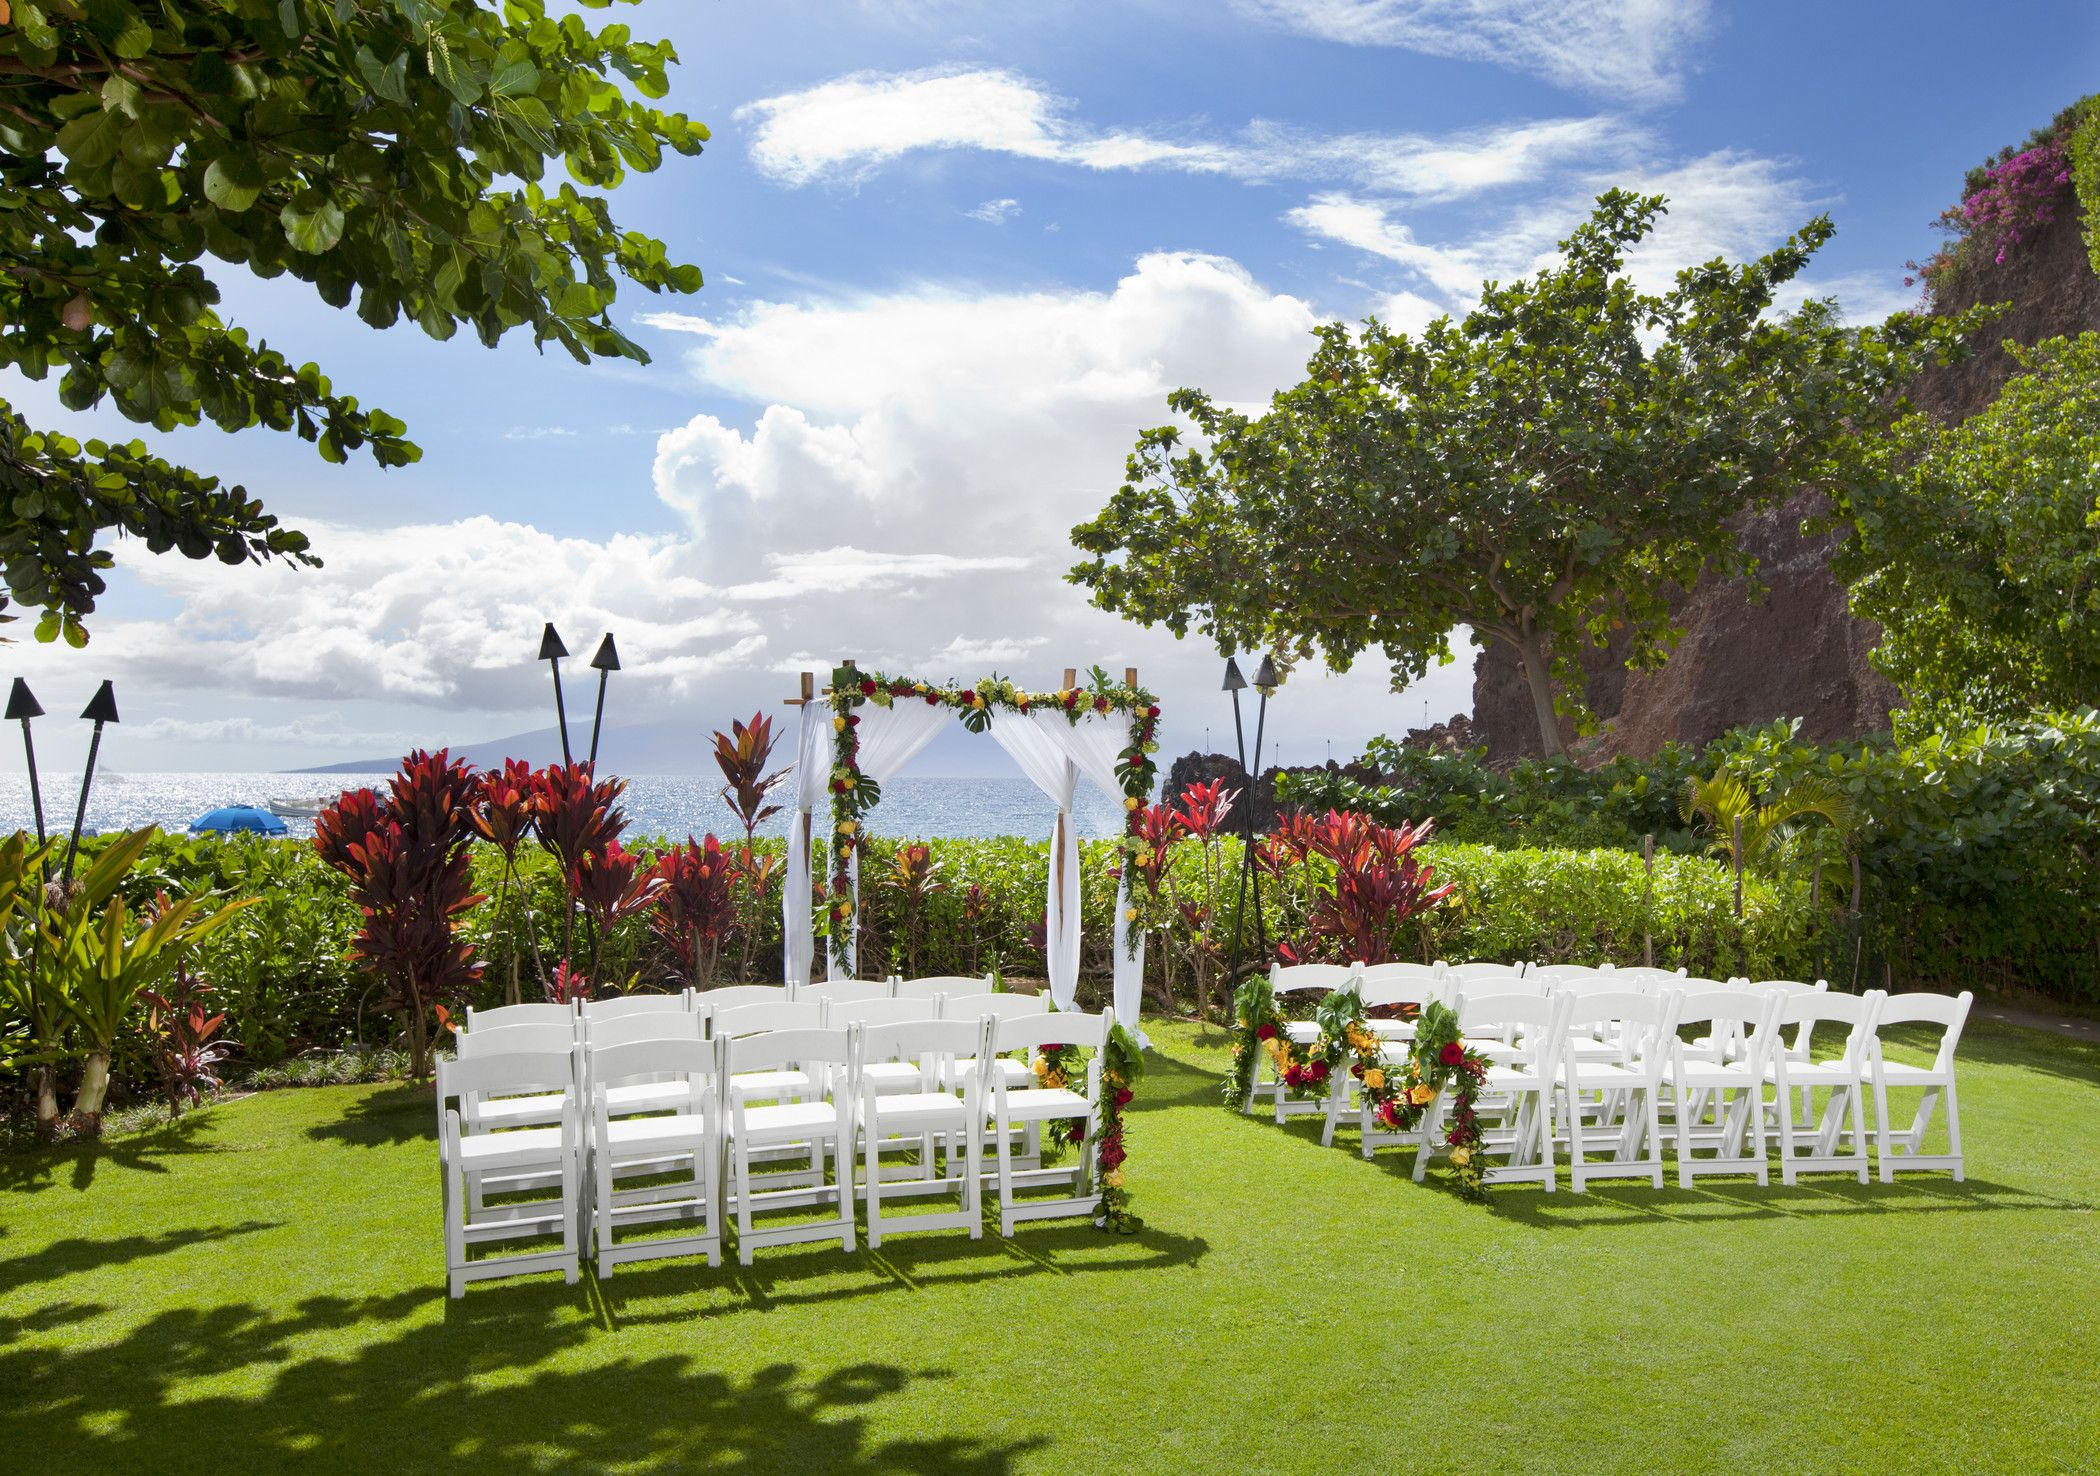 Maui wedding venues sheraton maui resort spa black rock lawn maui wedding venues sheraton maui resort spa black rock lawn kaanapali beach junglespirit Images